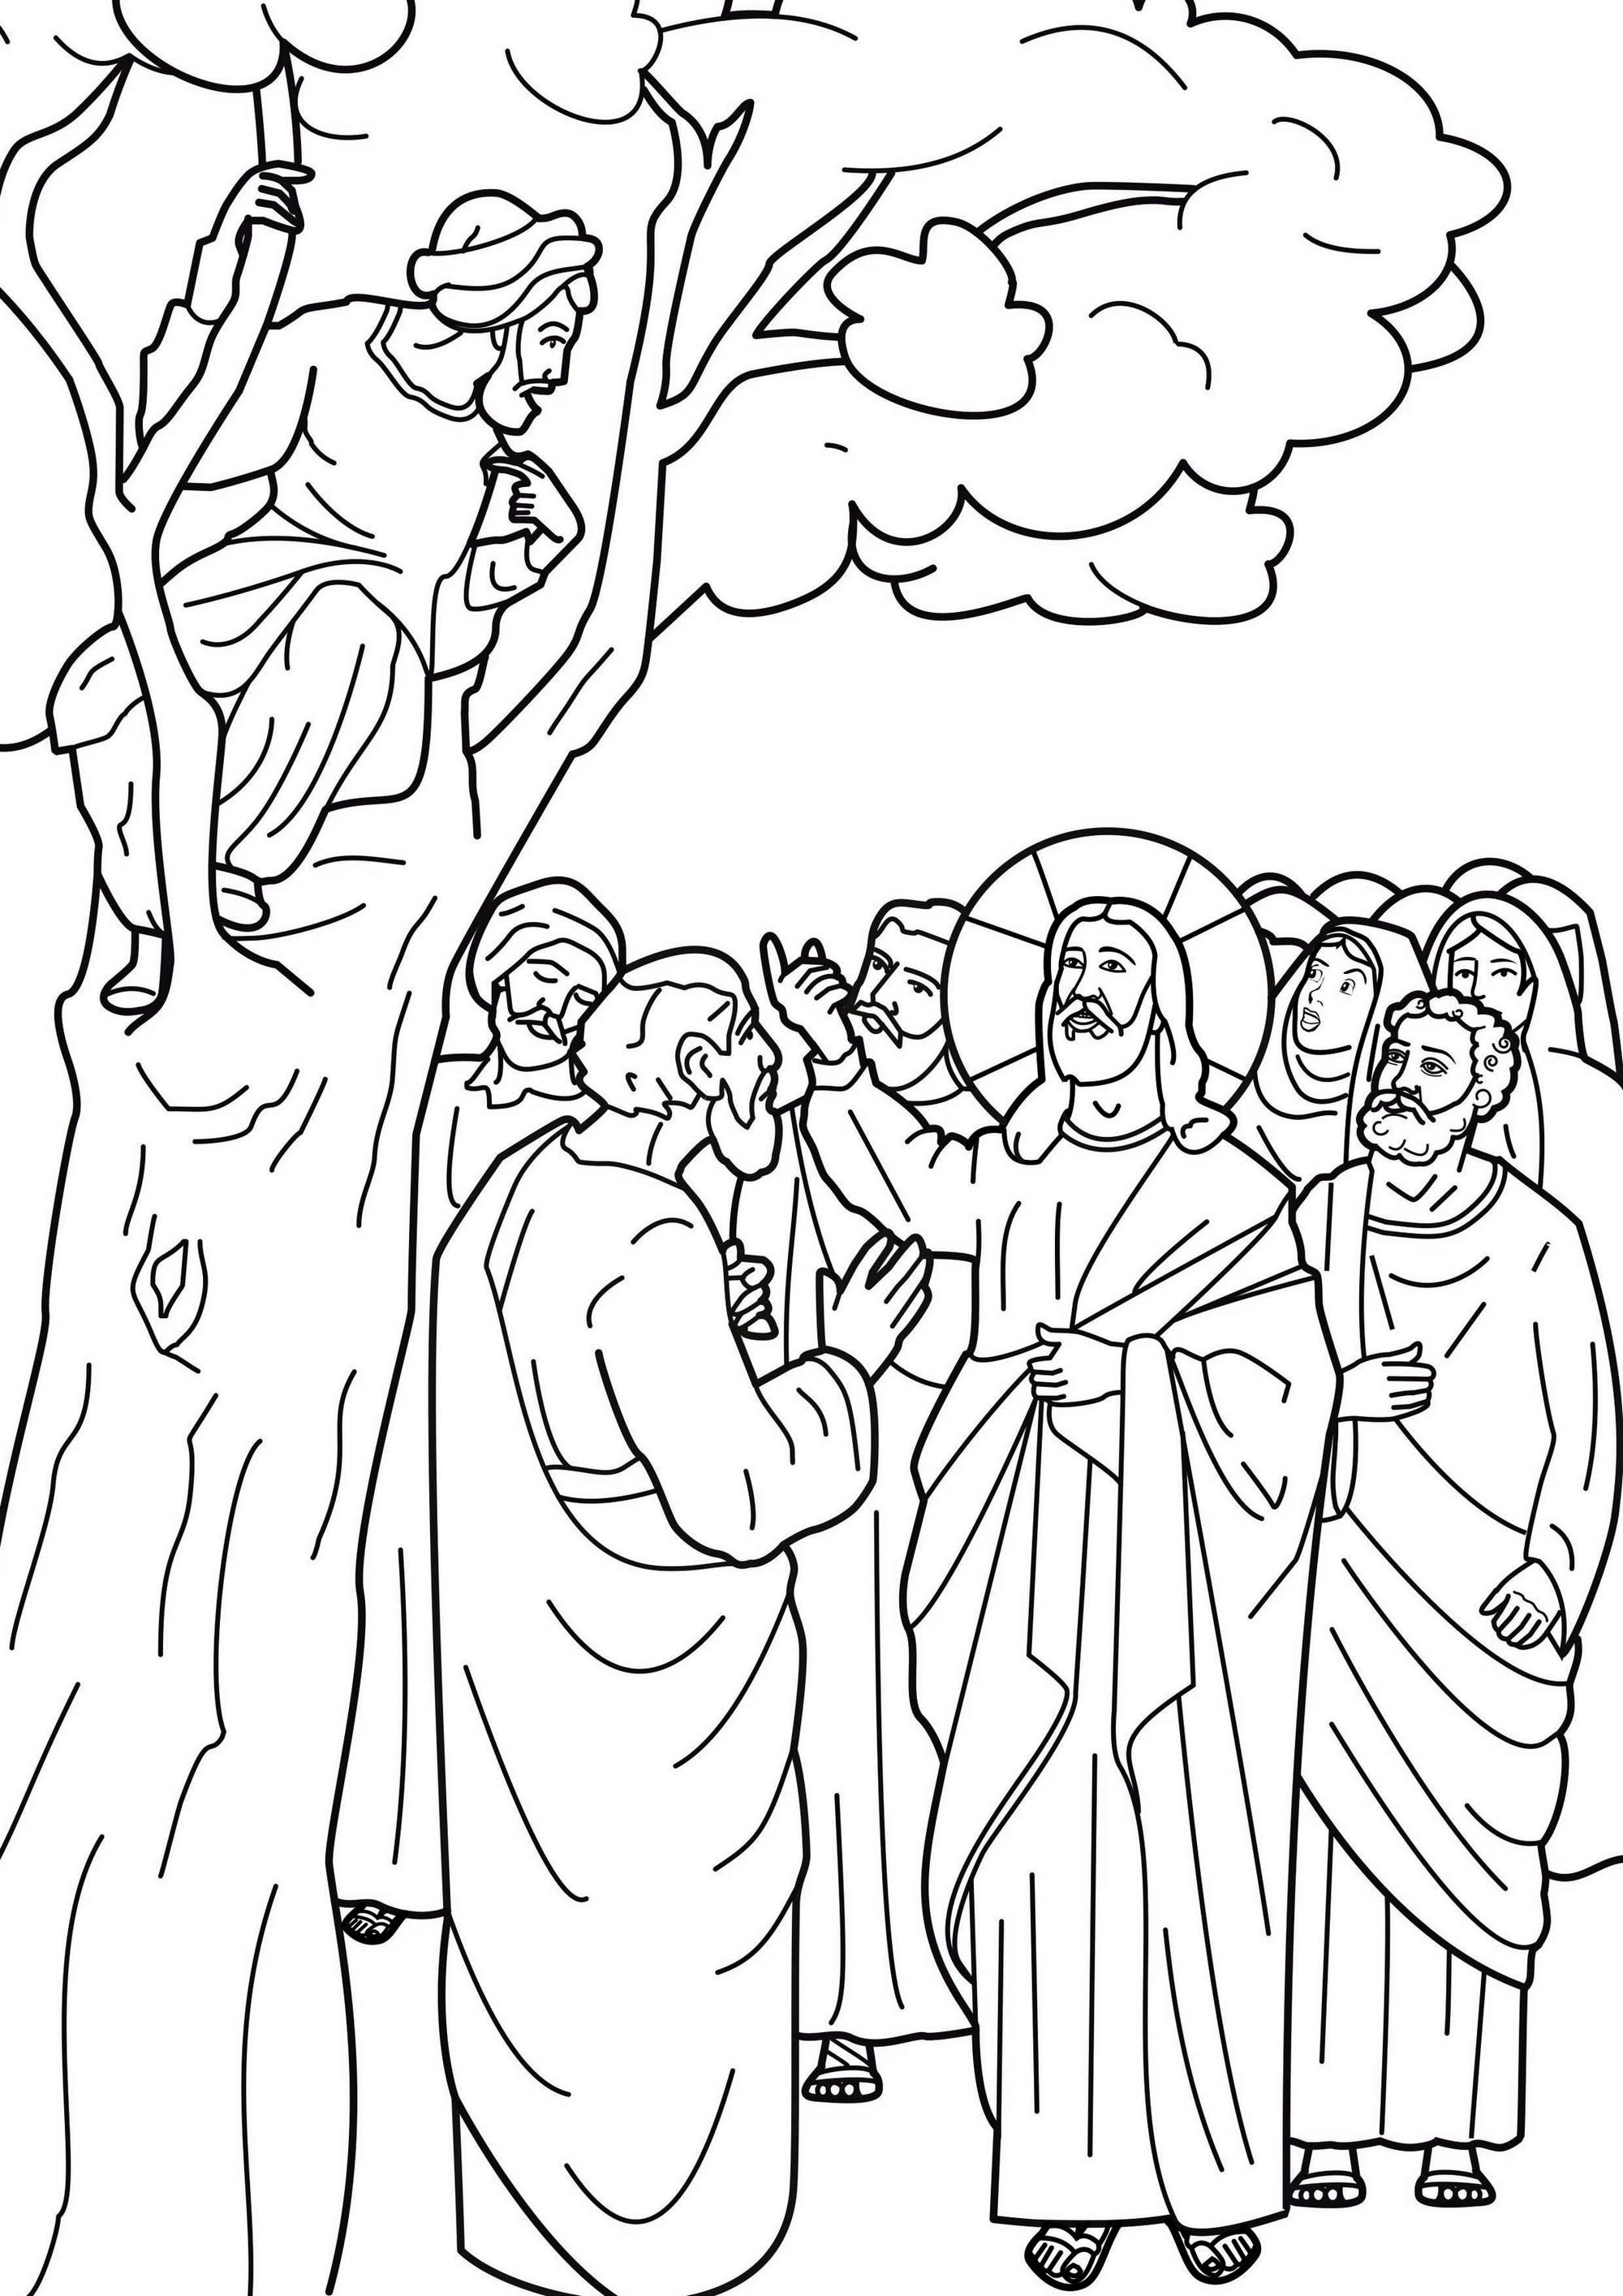 Jesus-calls-Zacchaeus-coloring-sheet